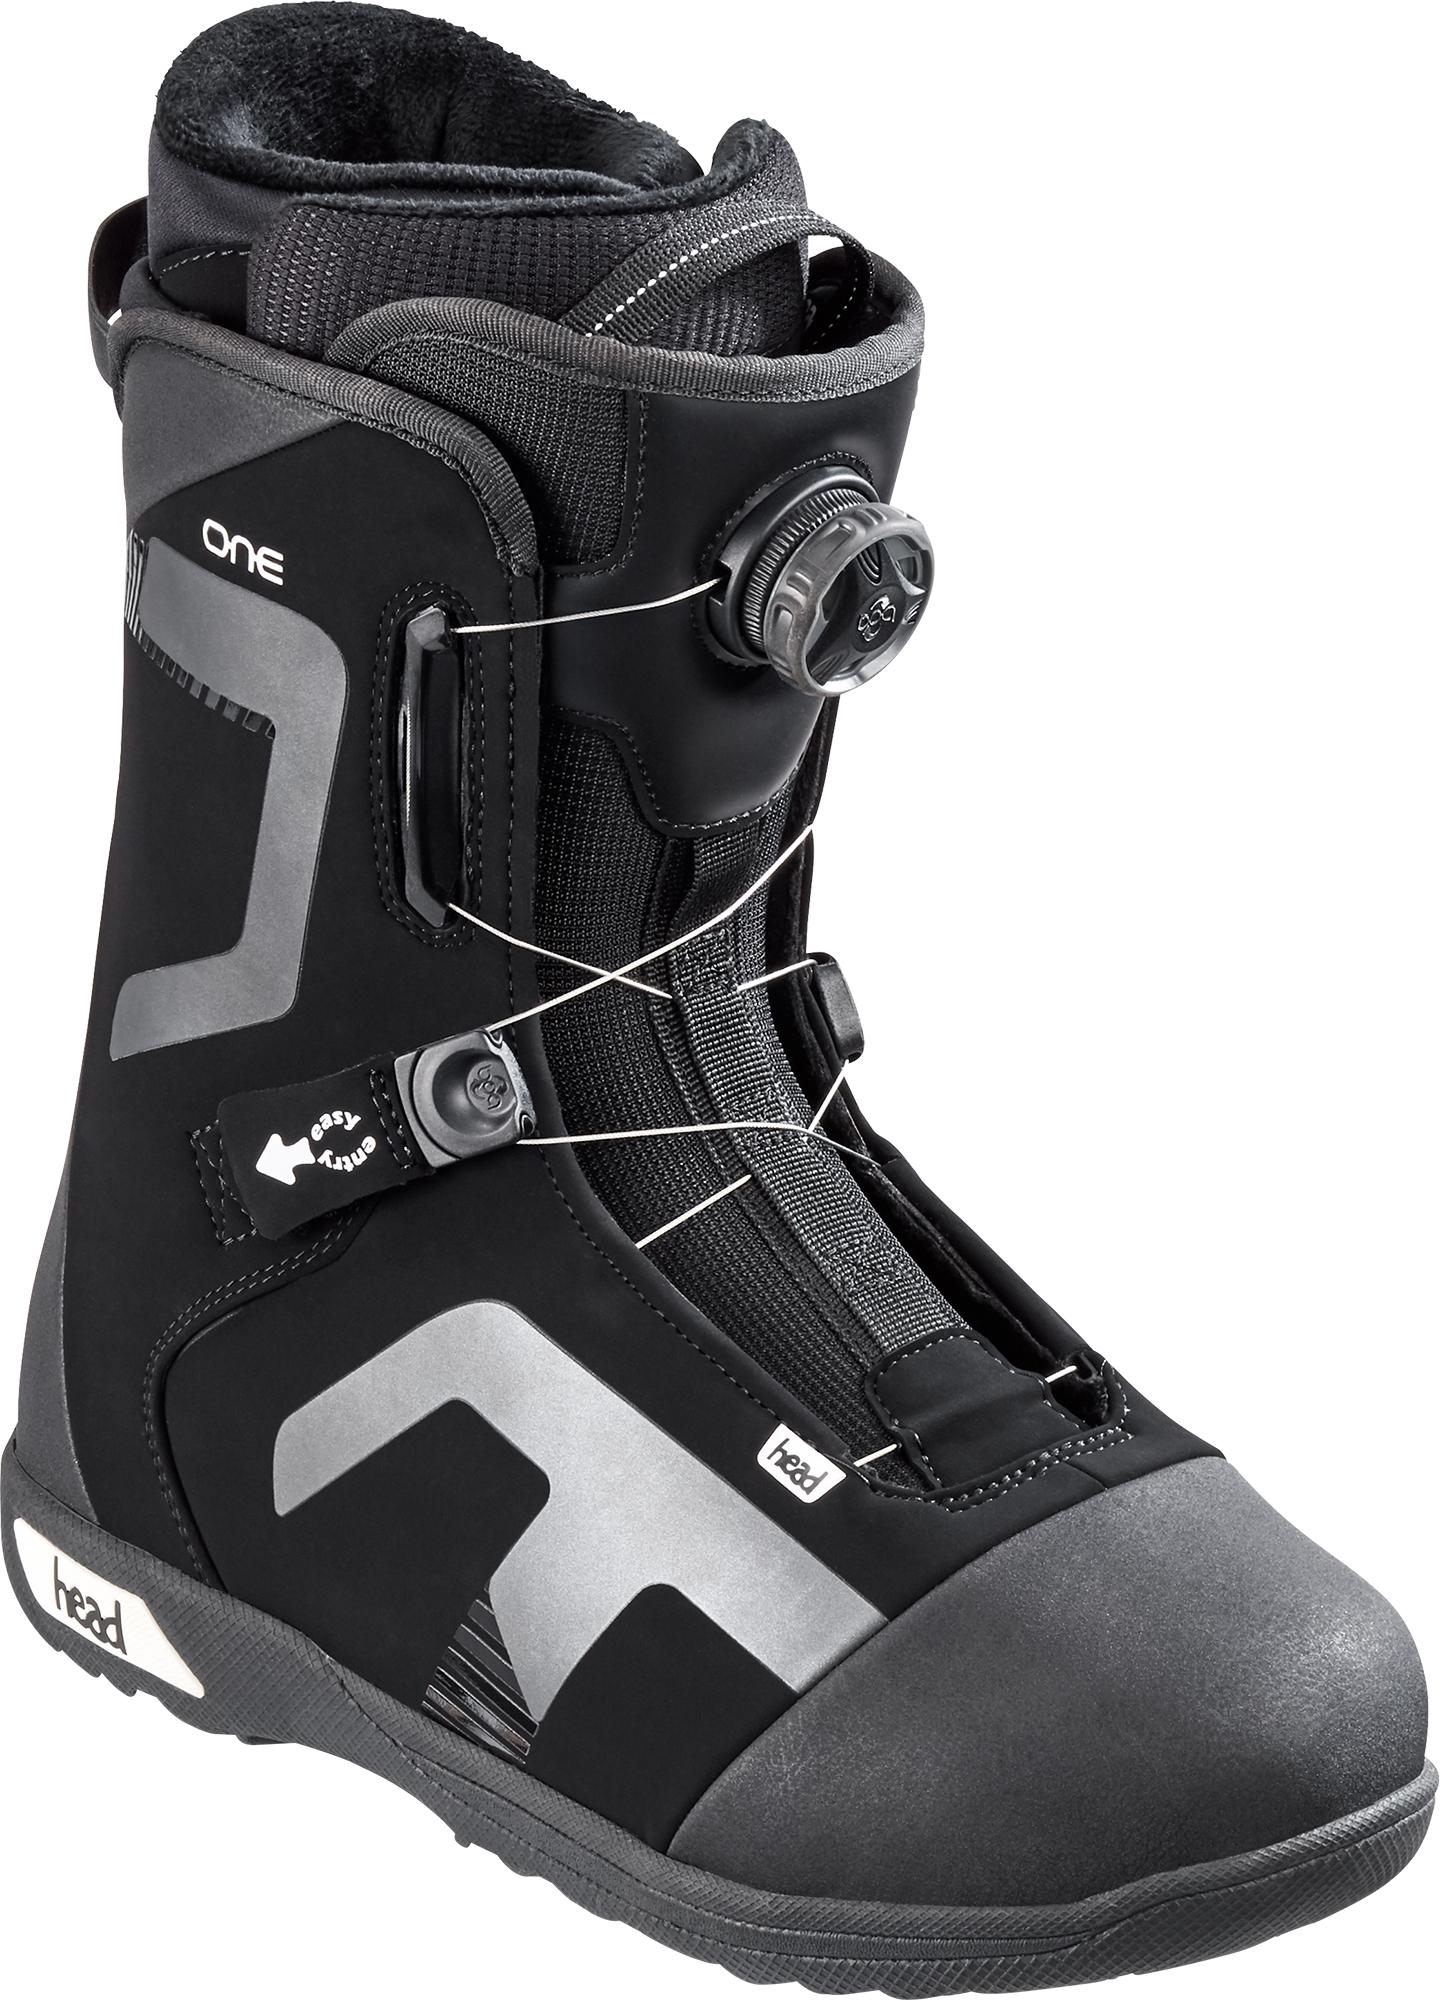 Head Сноубордические ботинки Head One Boa, размер 43 сноубордические ботинки black fire scoop 16 17 размер 45